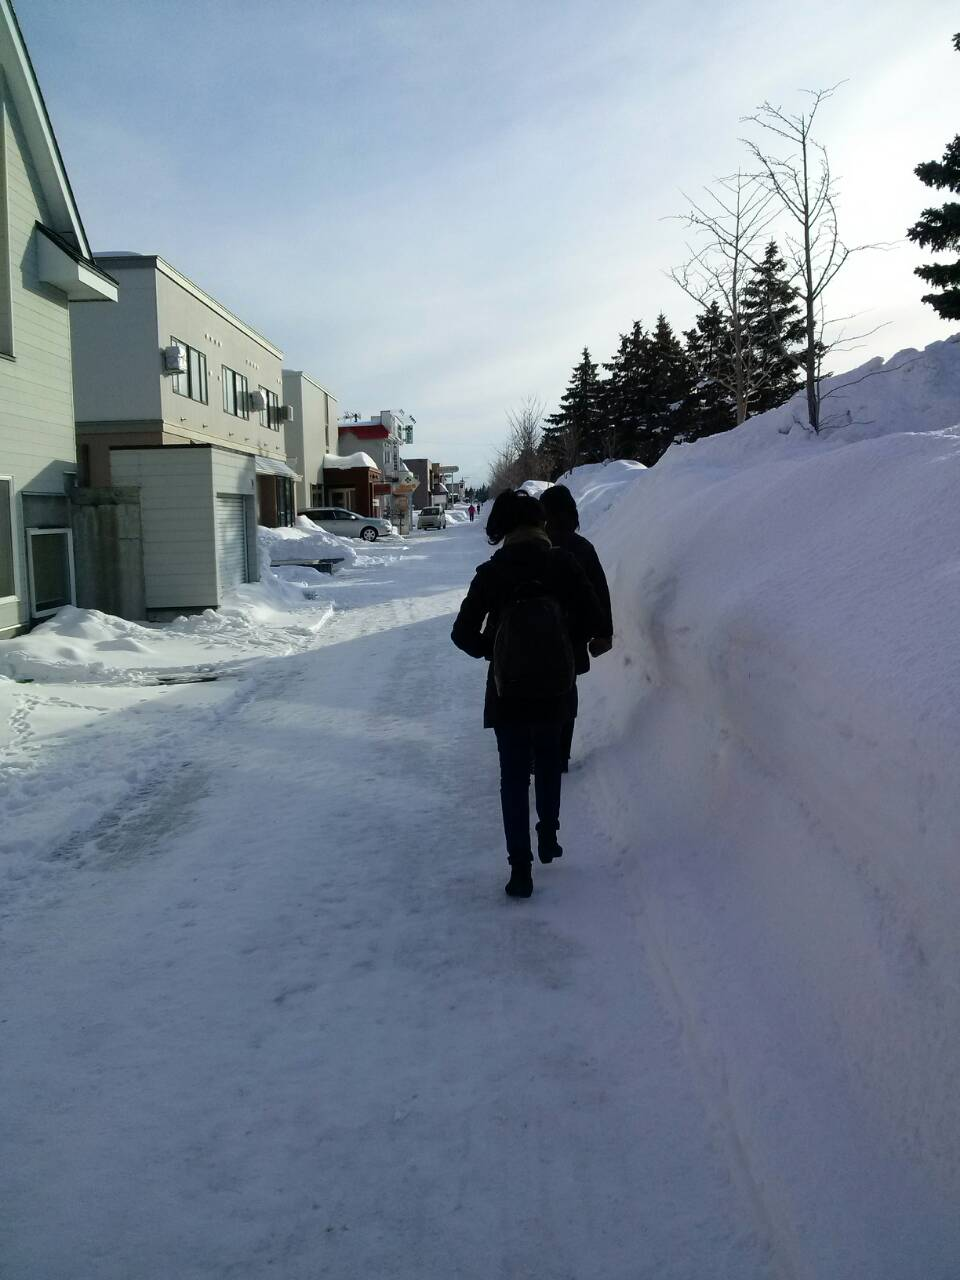 Medan yang harus kami tempuh setelah turun dari bus: salju!